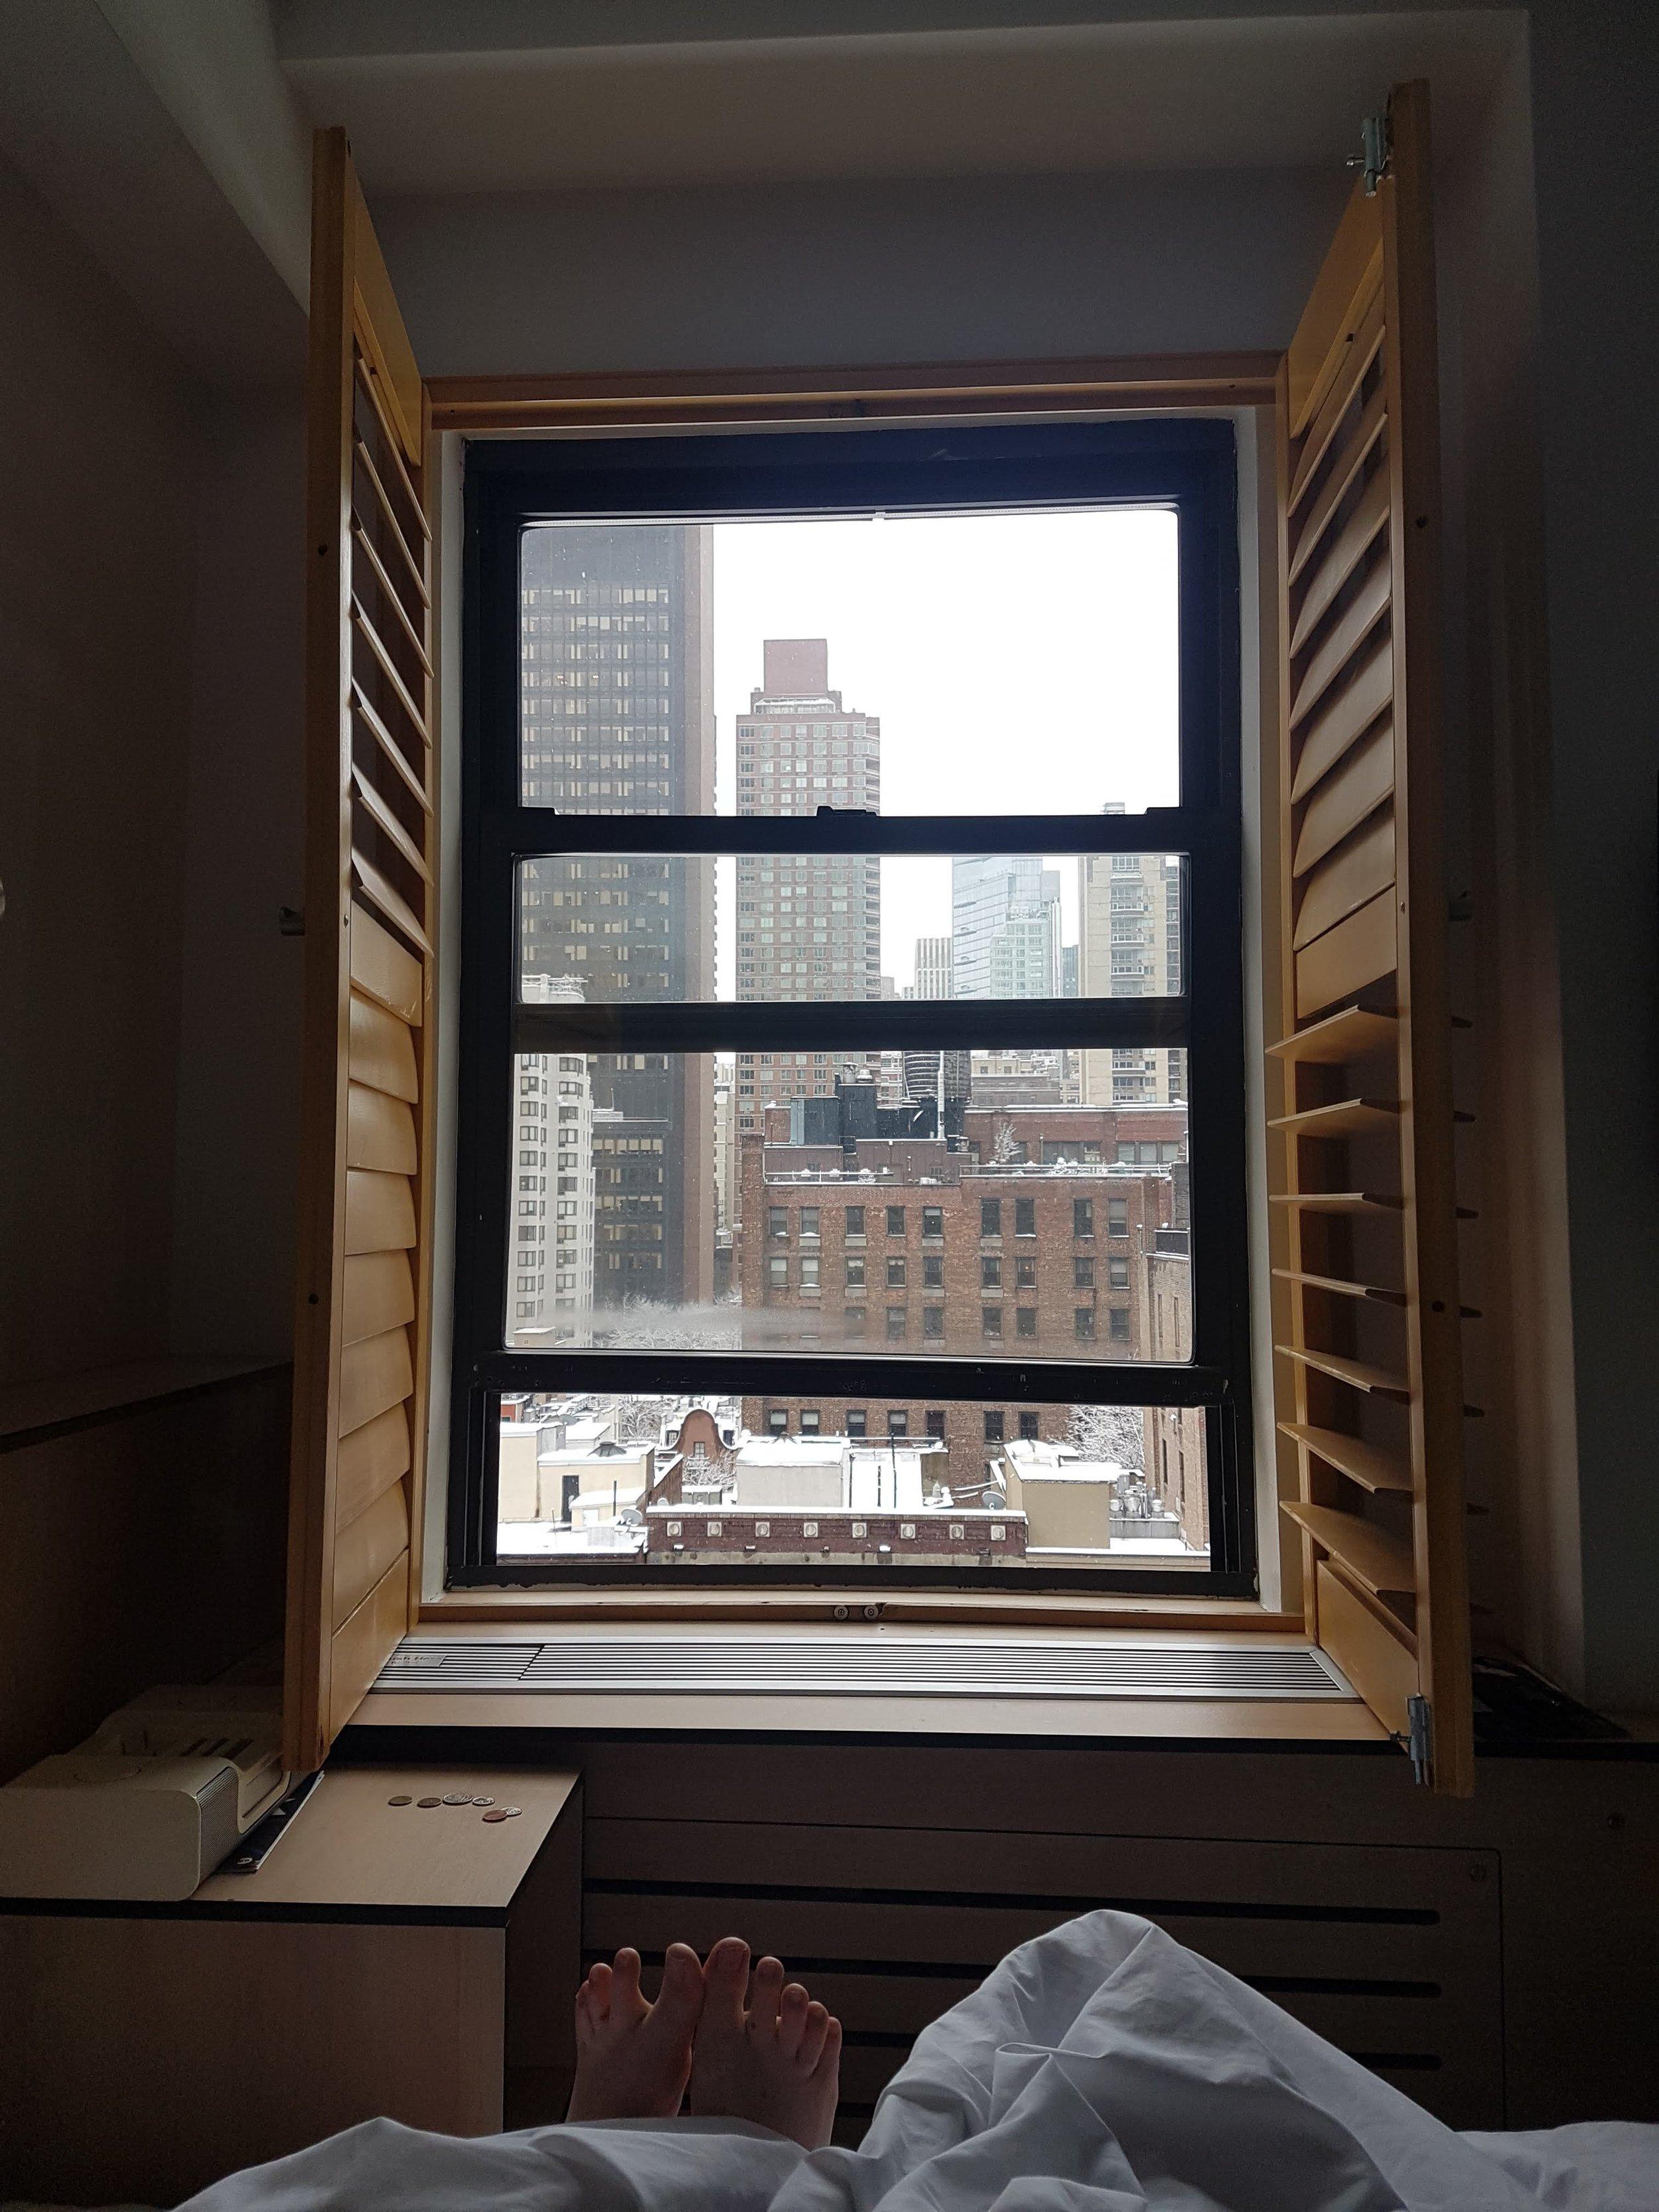 cozy in bed new york city.jpg